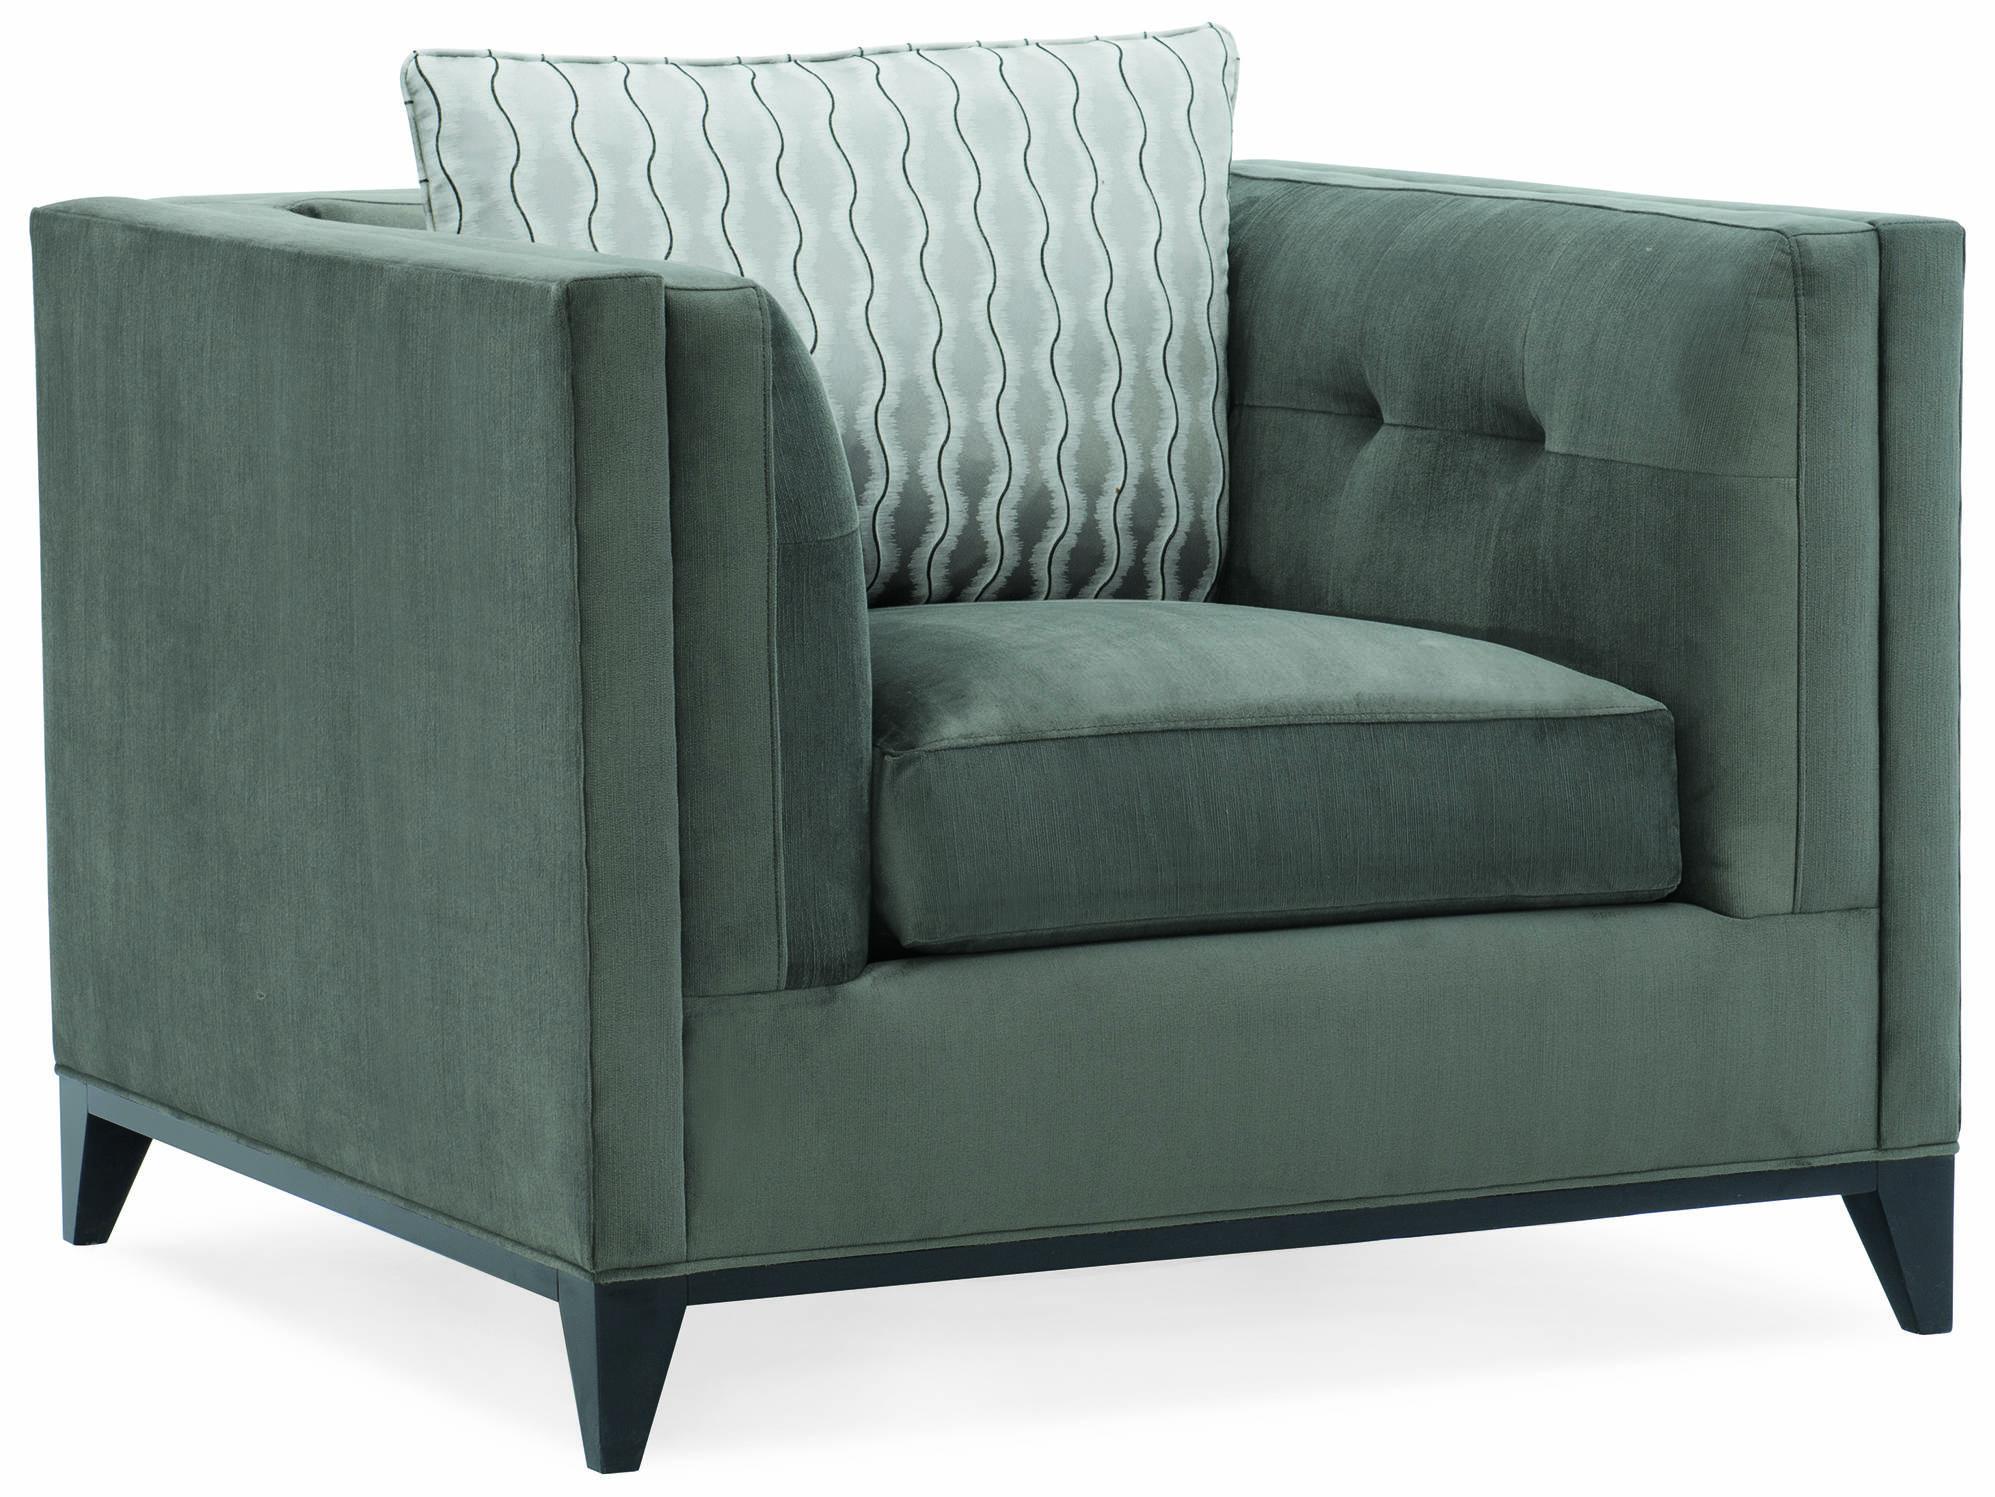 Phenomenal Caracole Modern Grace Flannel Grey Accent Chair Inzonedesignstudio Interior Chair Design Inzonedesignstudiocom